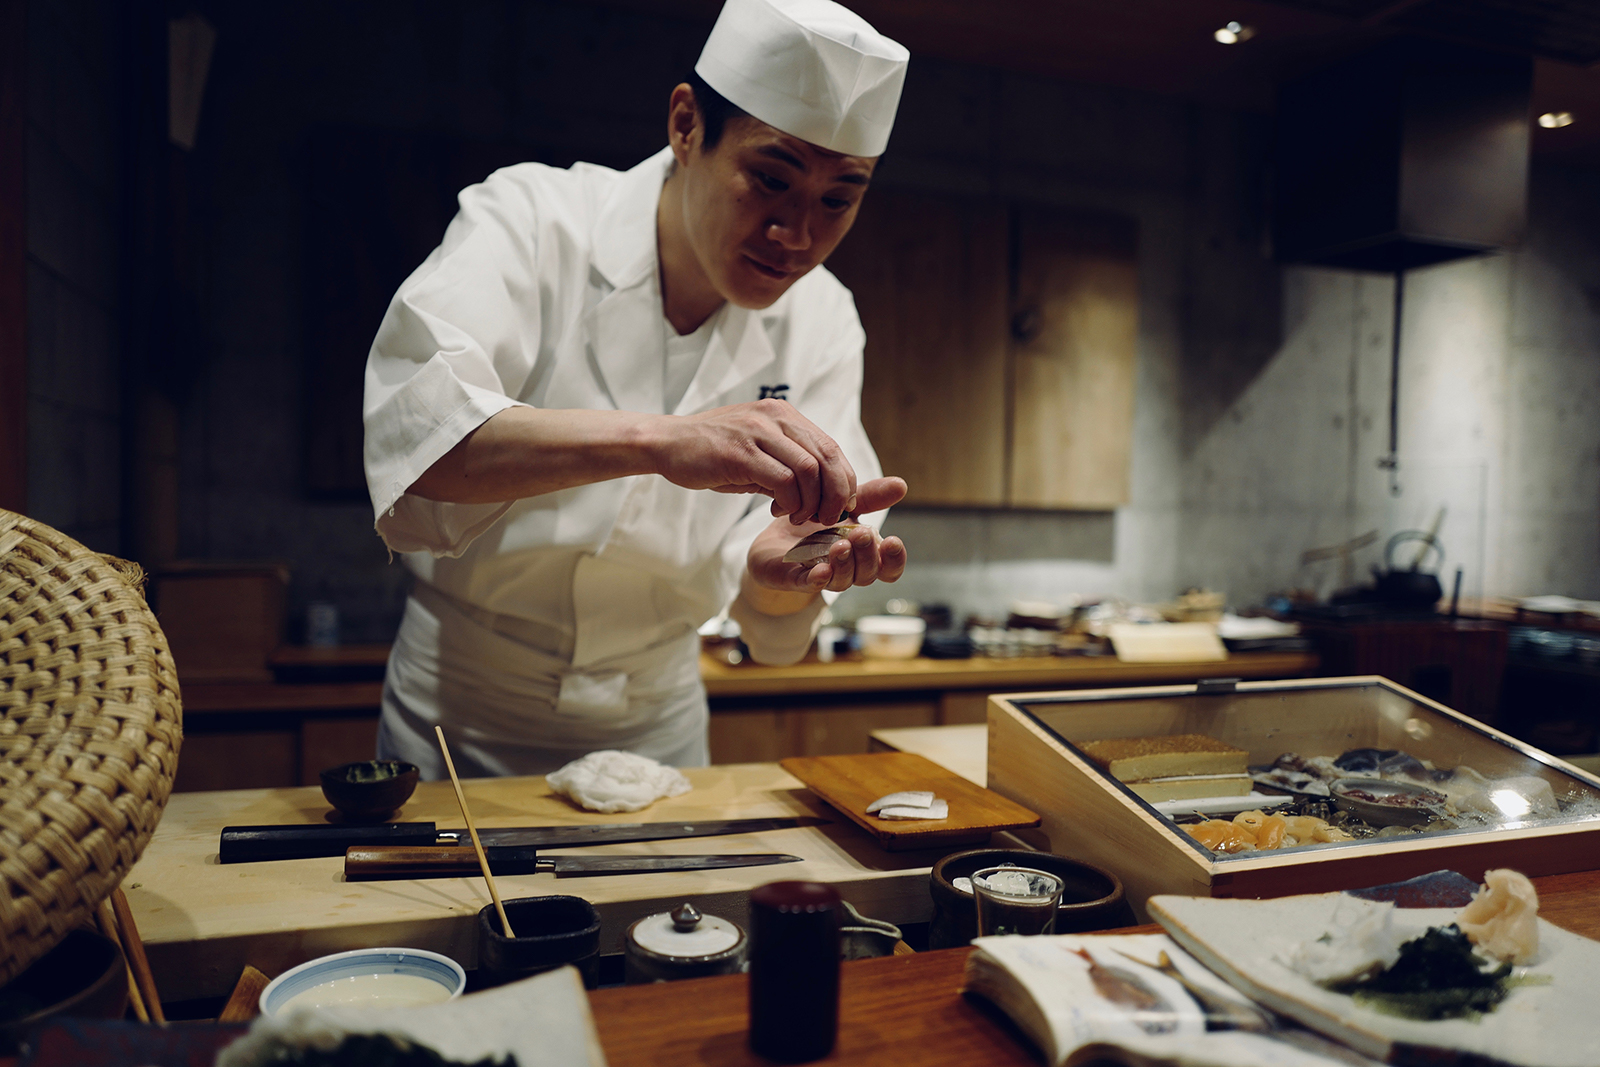 Asian chef preparing sushi